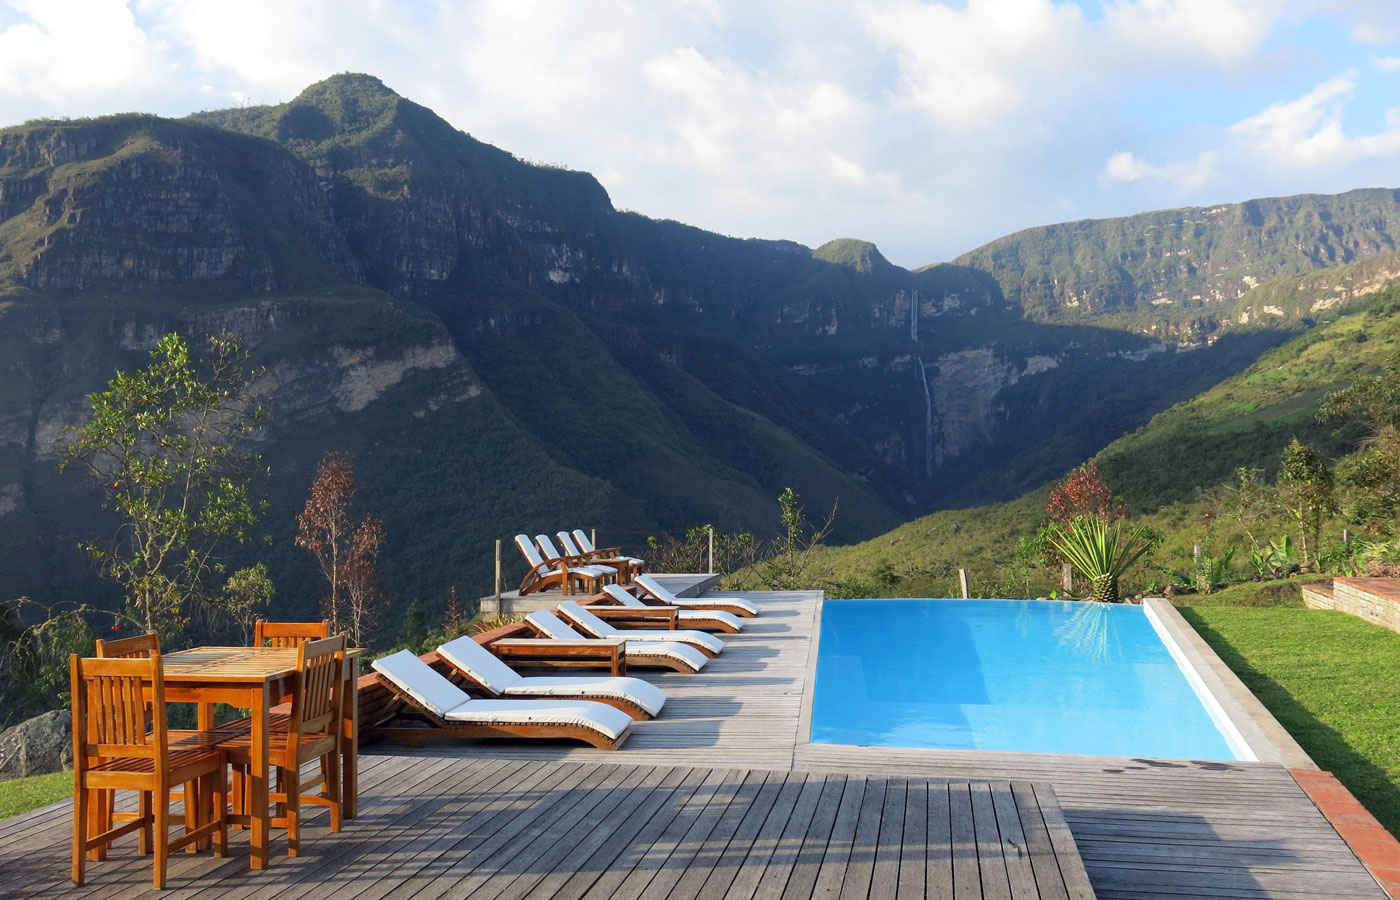 Gocta Lodge - Luxury holiday to Peru